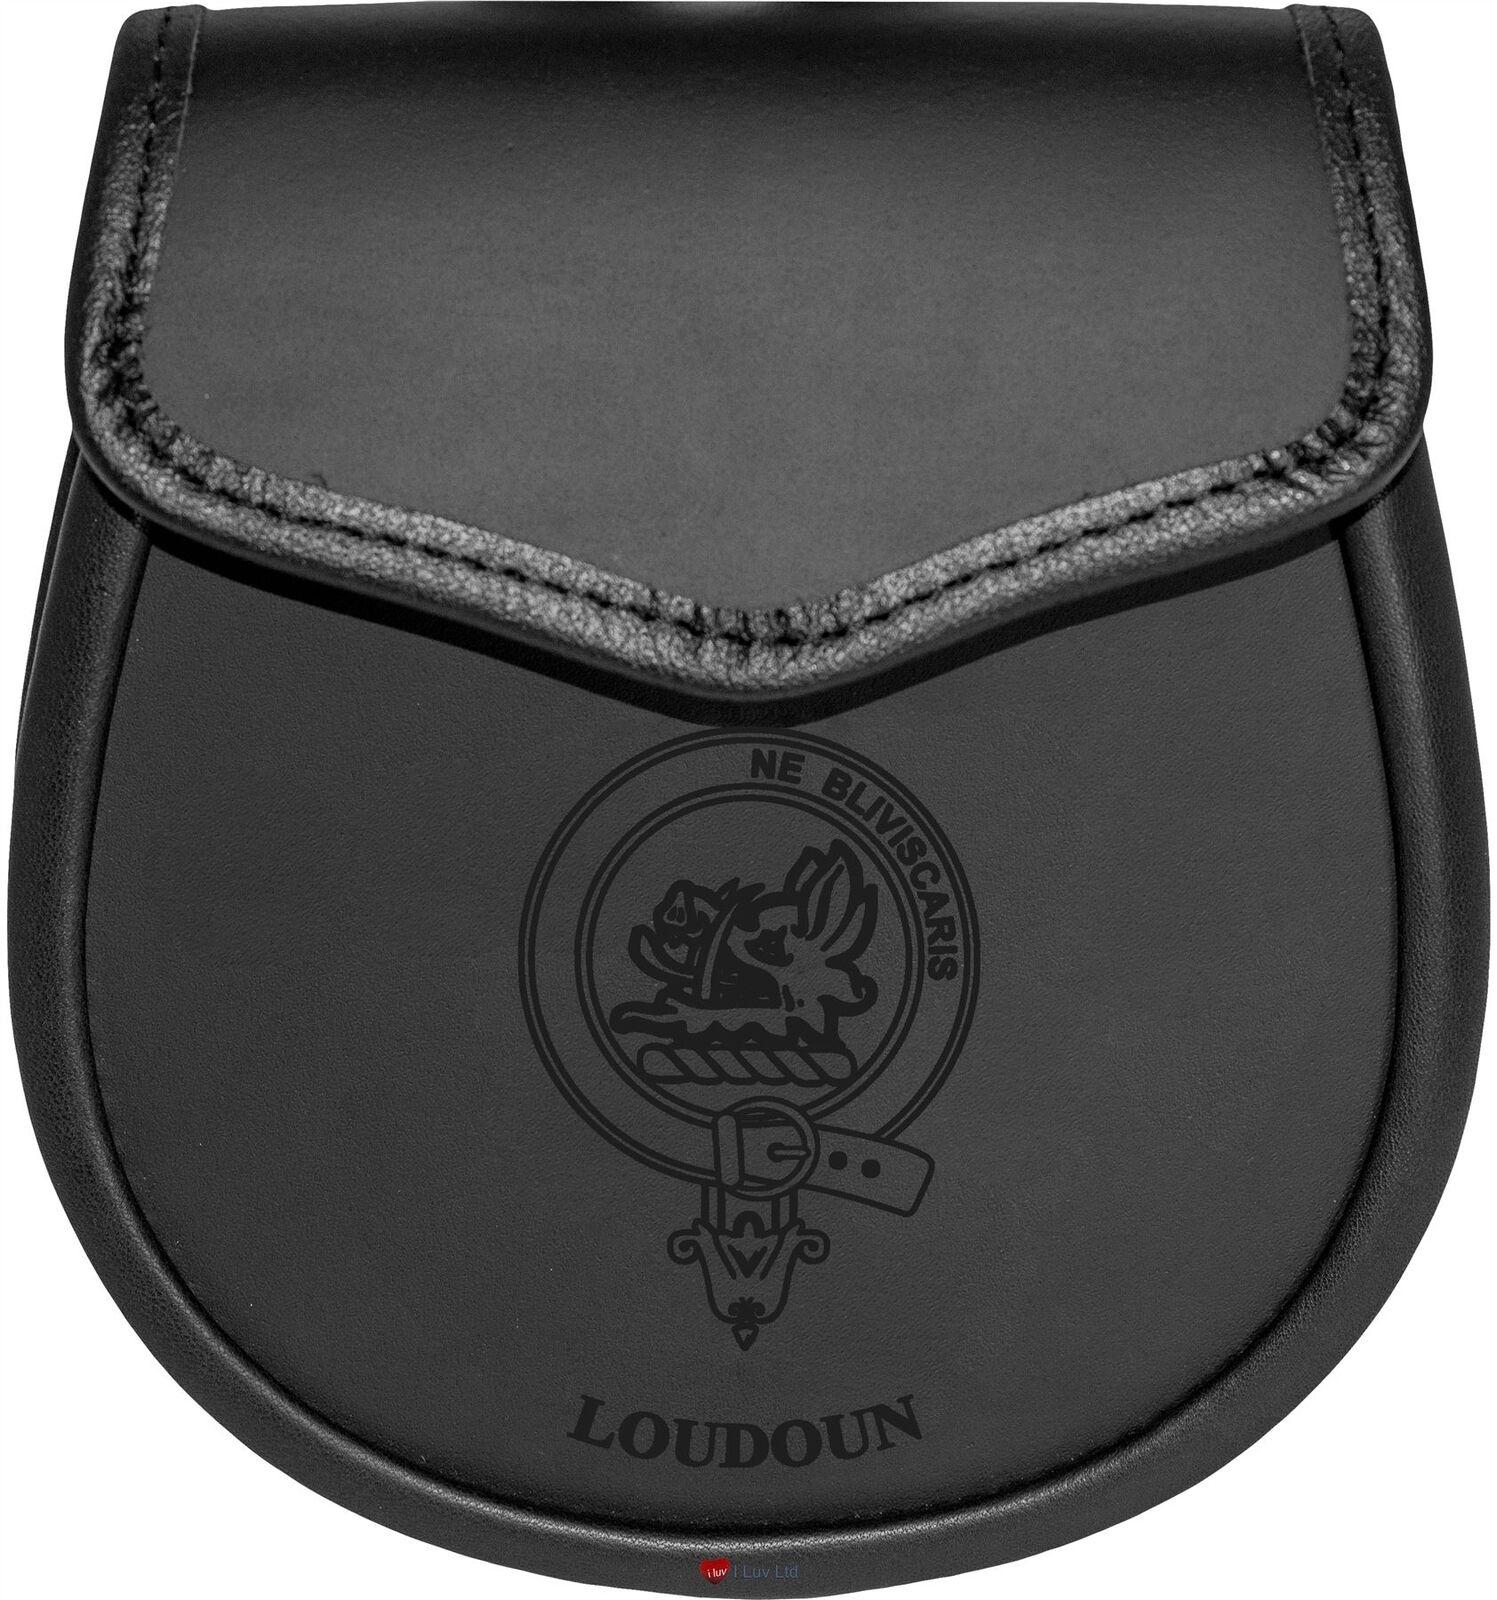 Loudoun Leather Day Sporran Scottish Clan Crest